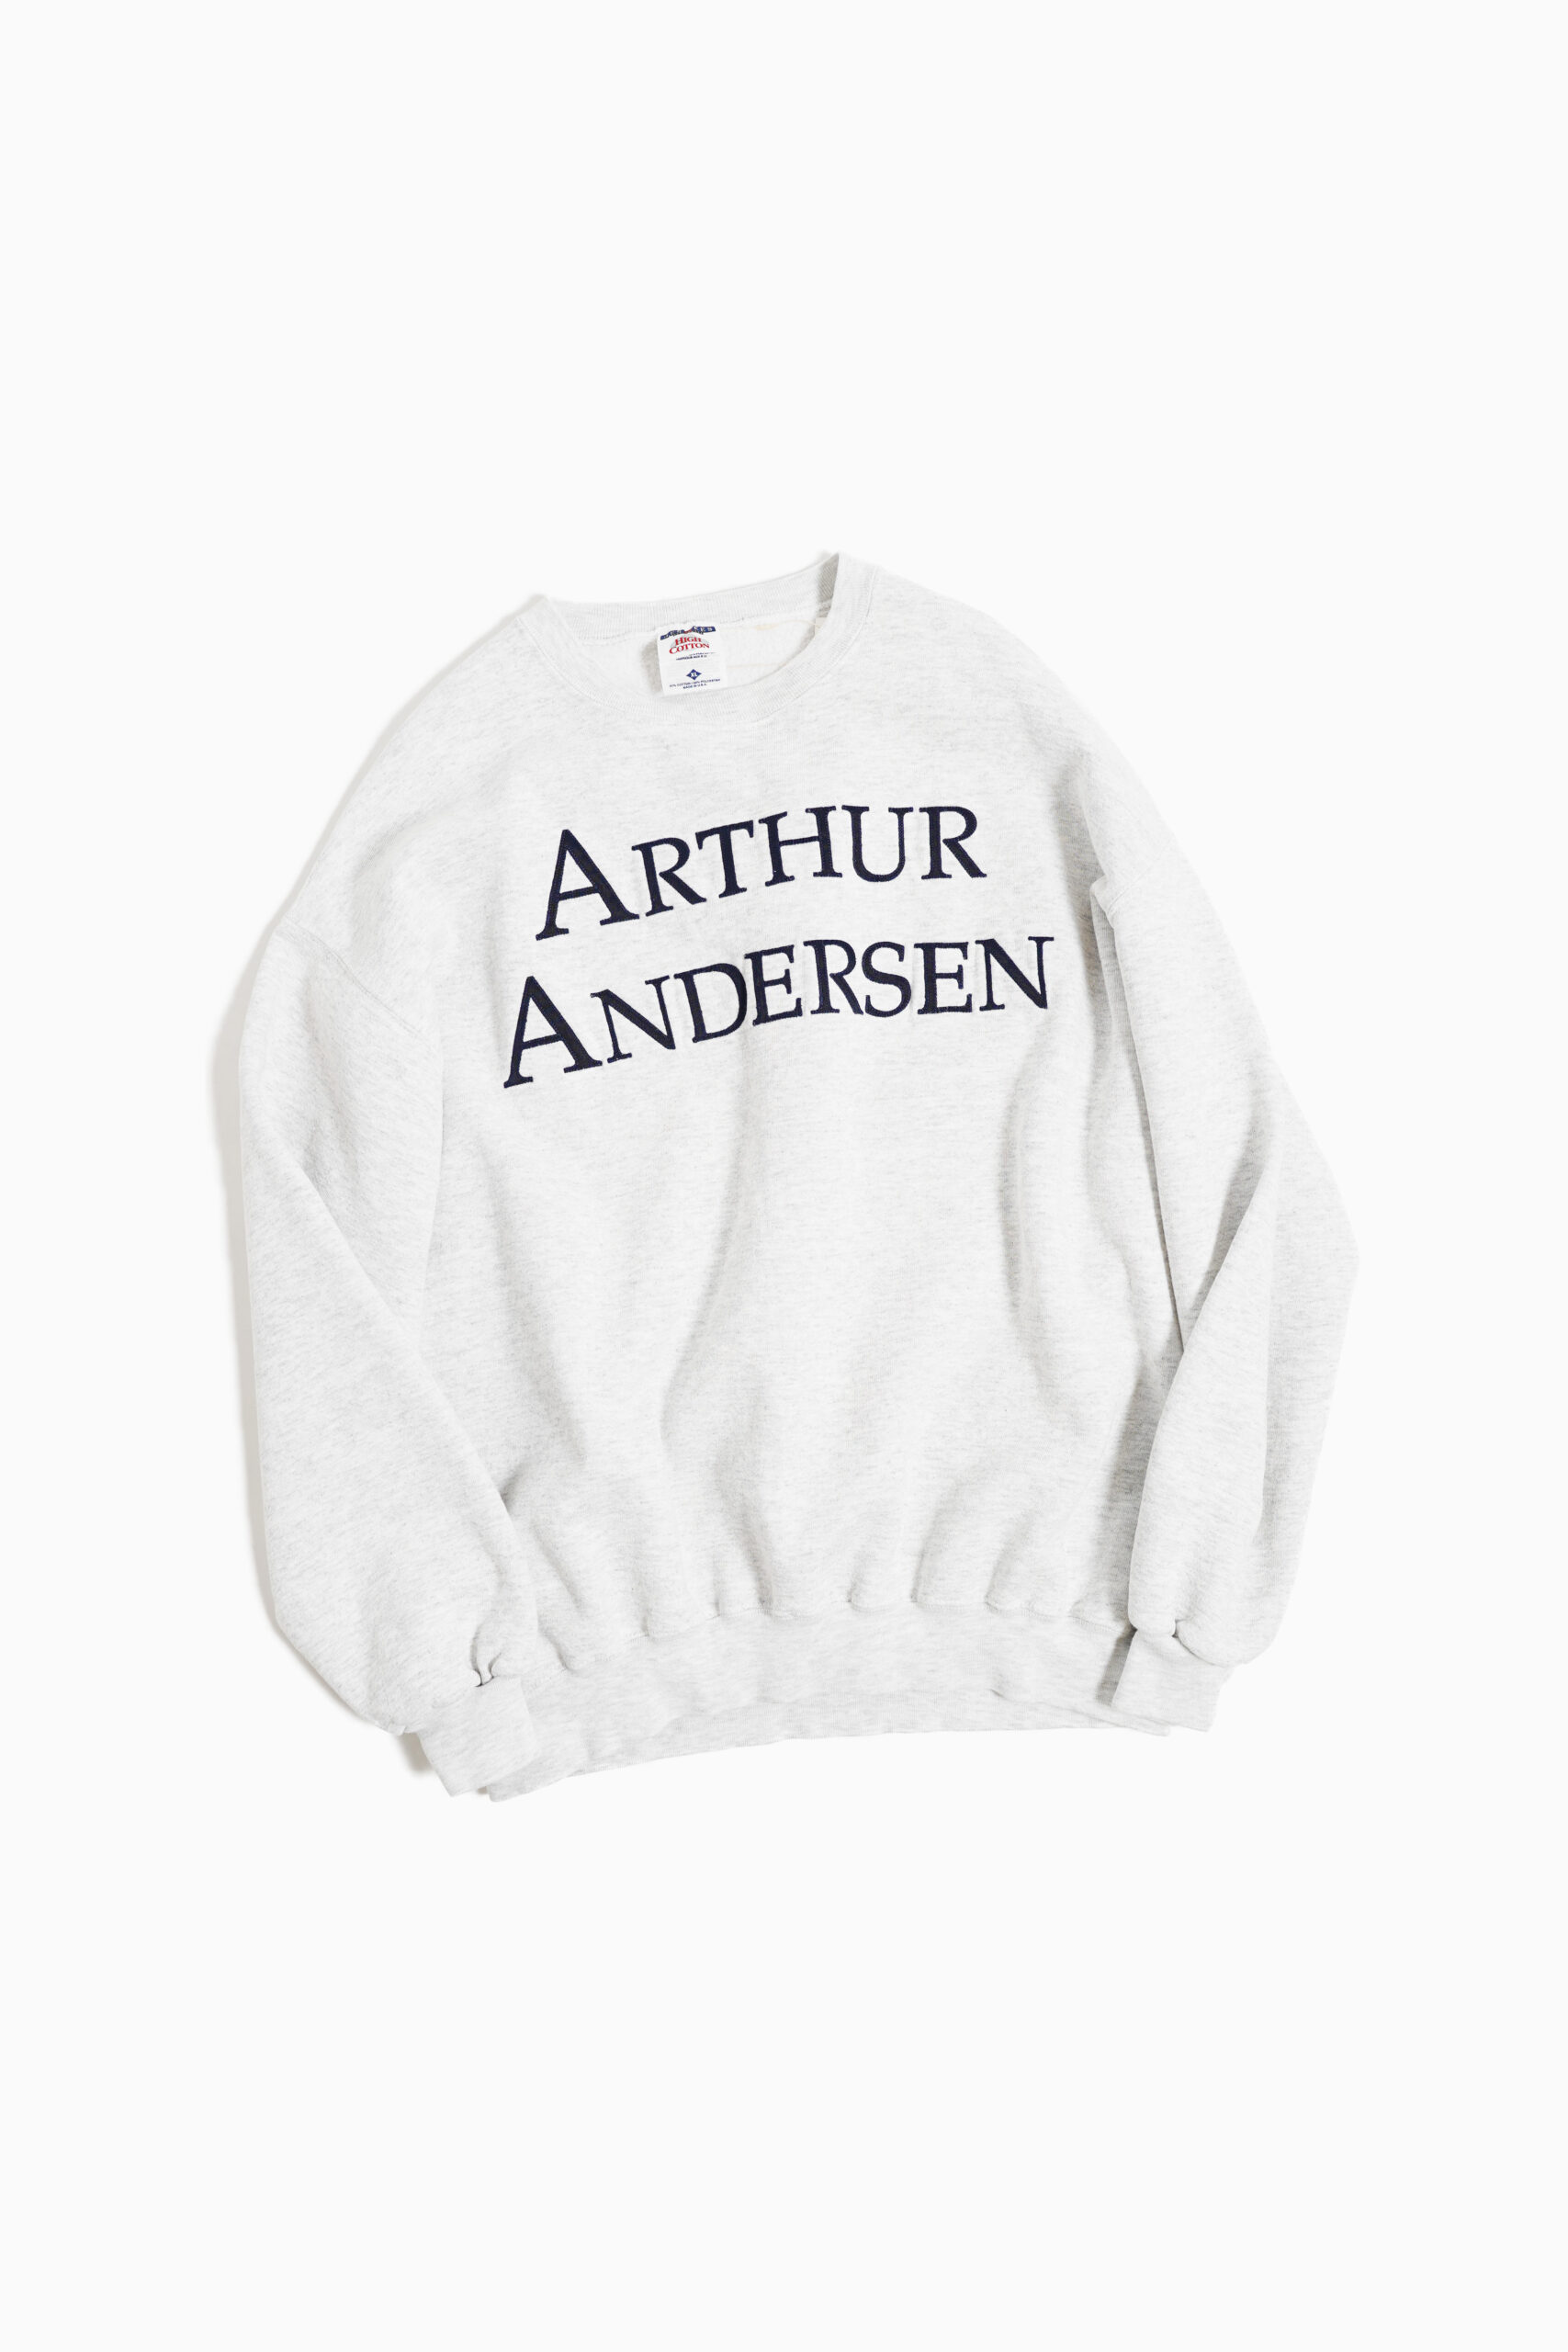 ARTHUR ANDERSEN SWEAT